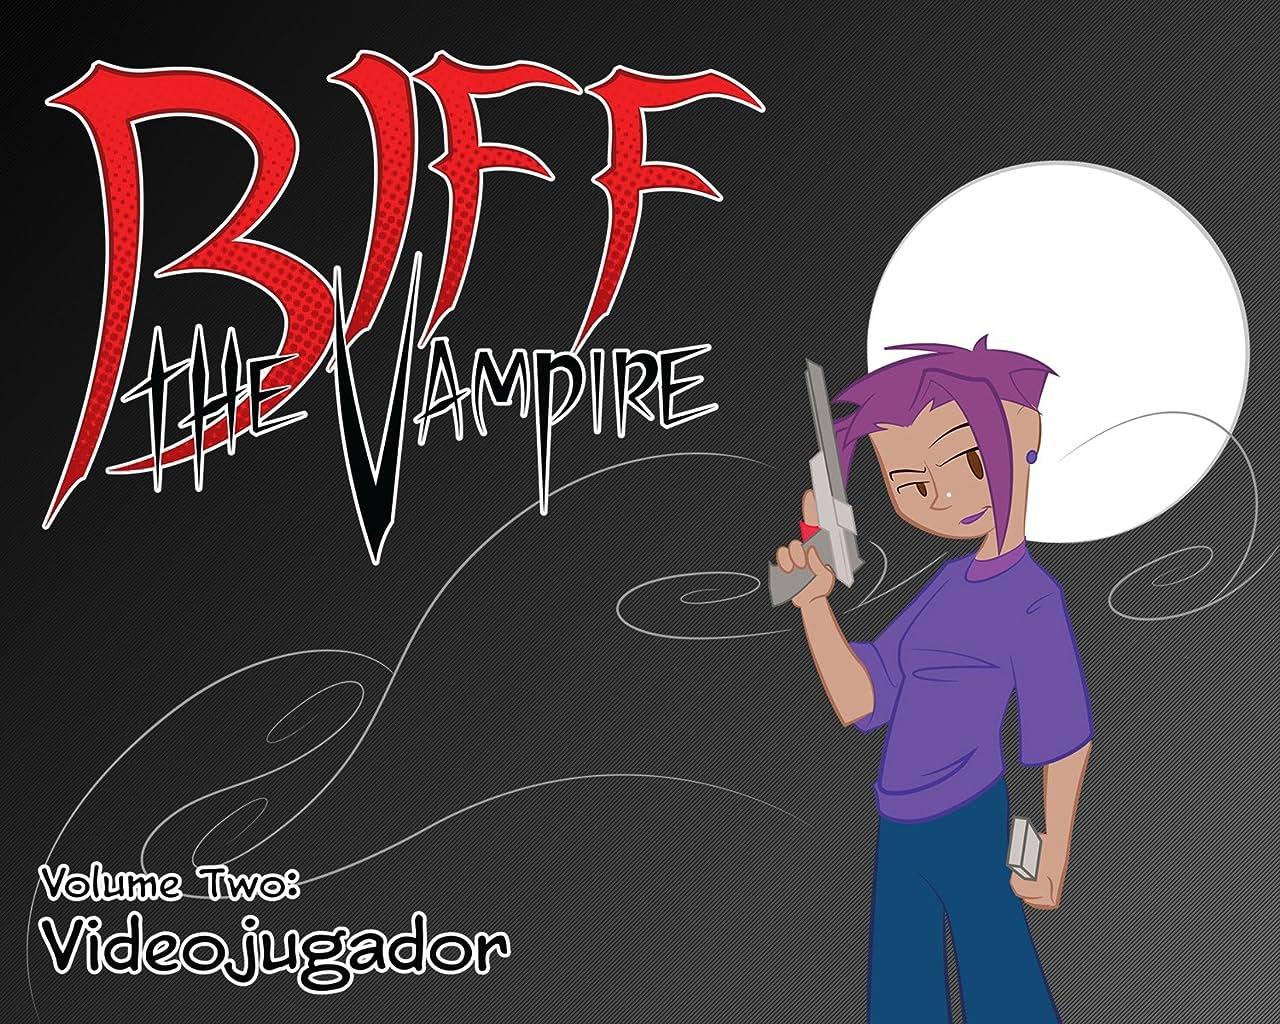 Biff the Vampire Vol. 2: Videojugador